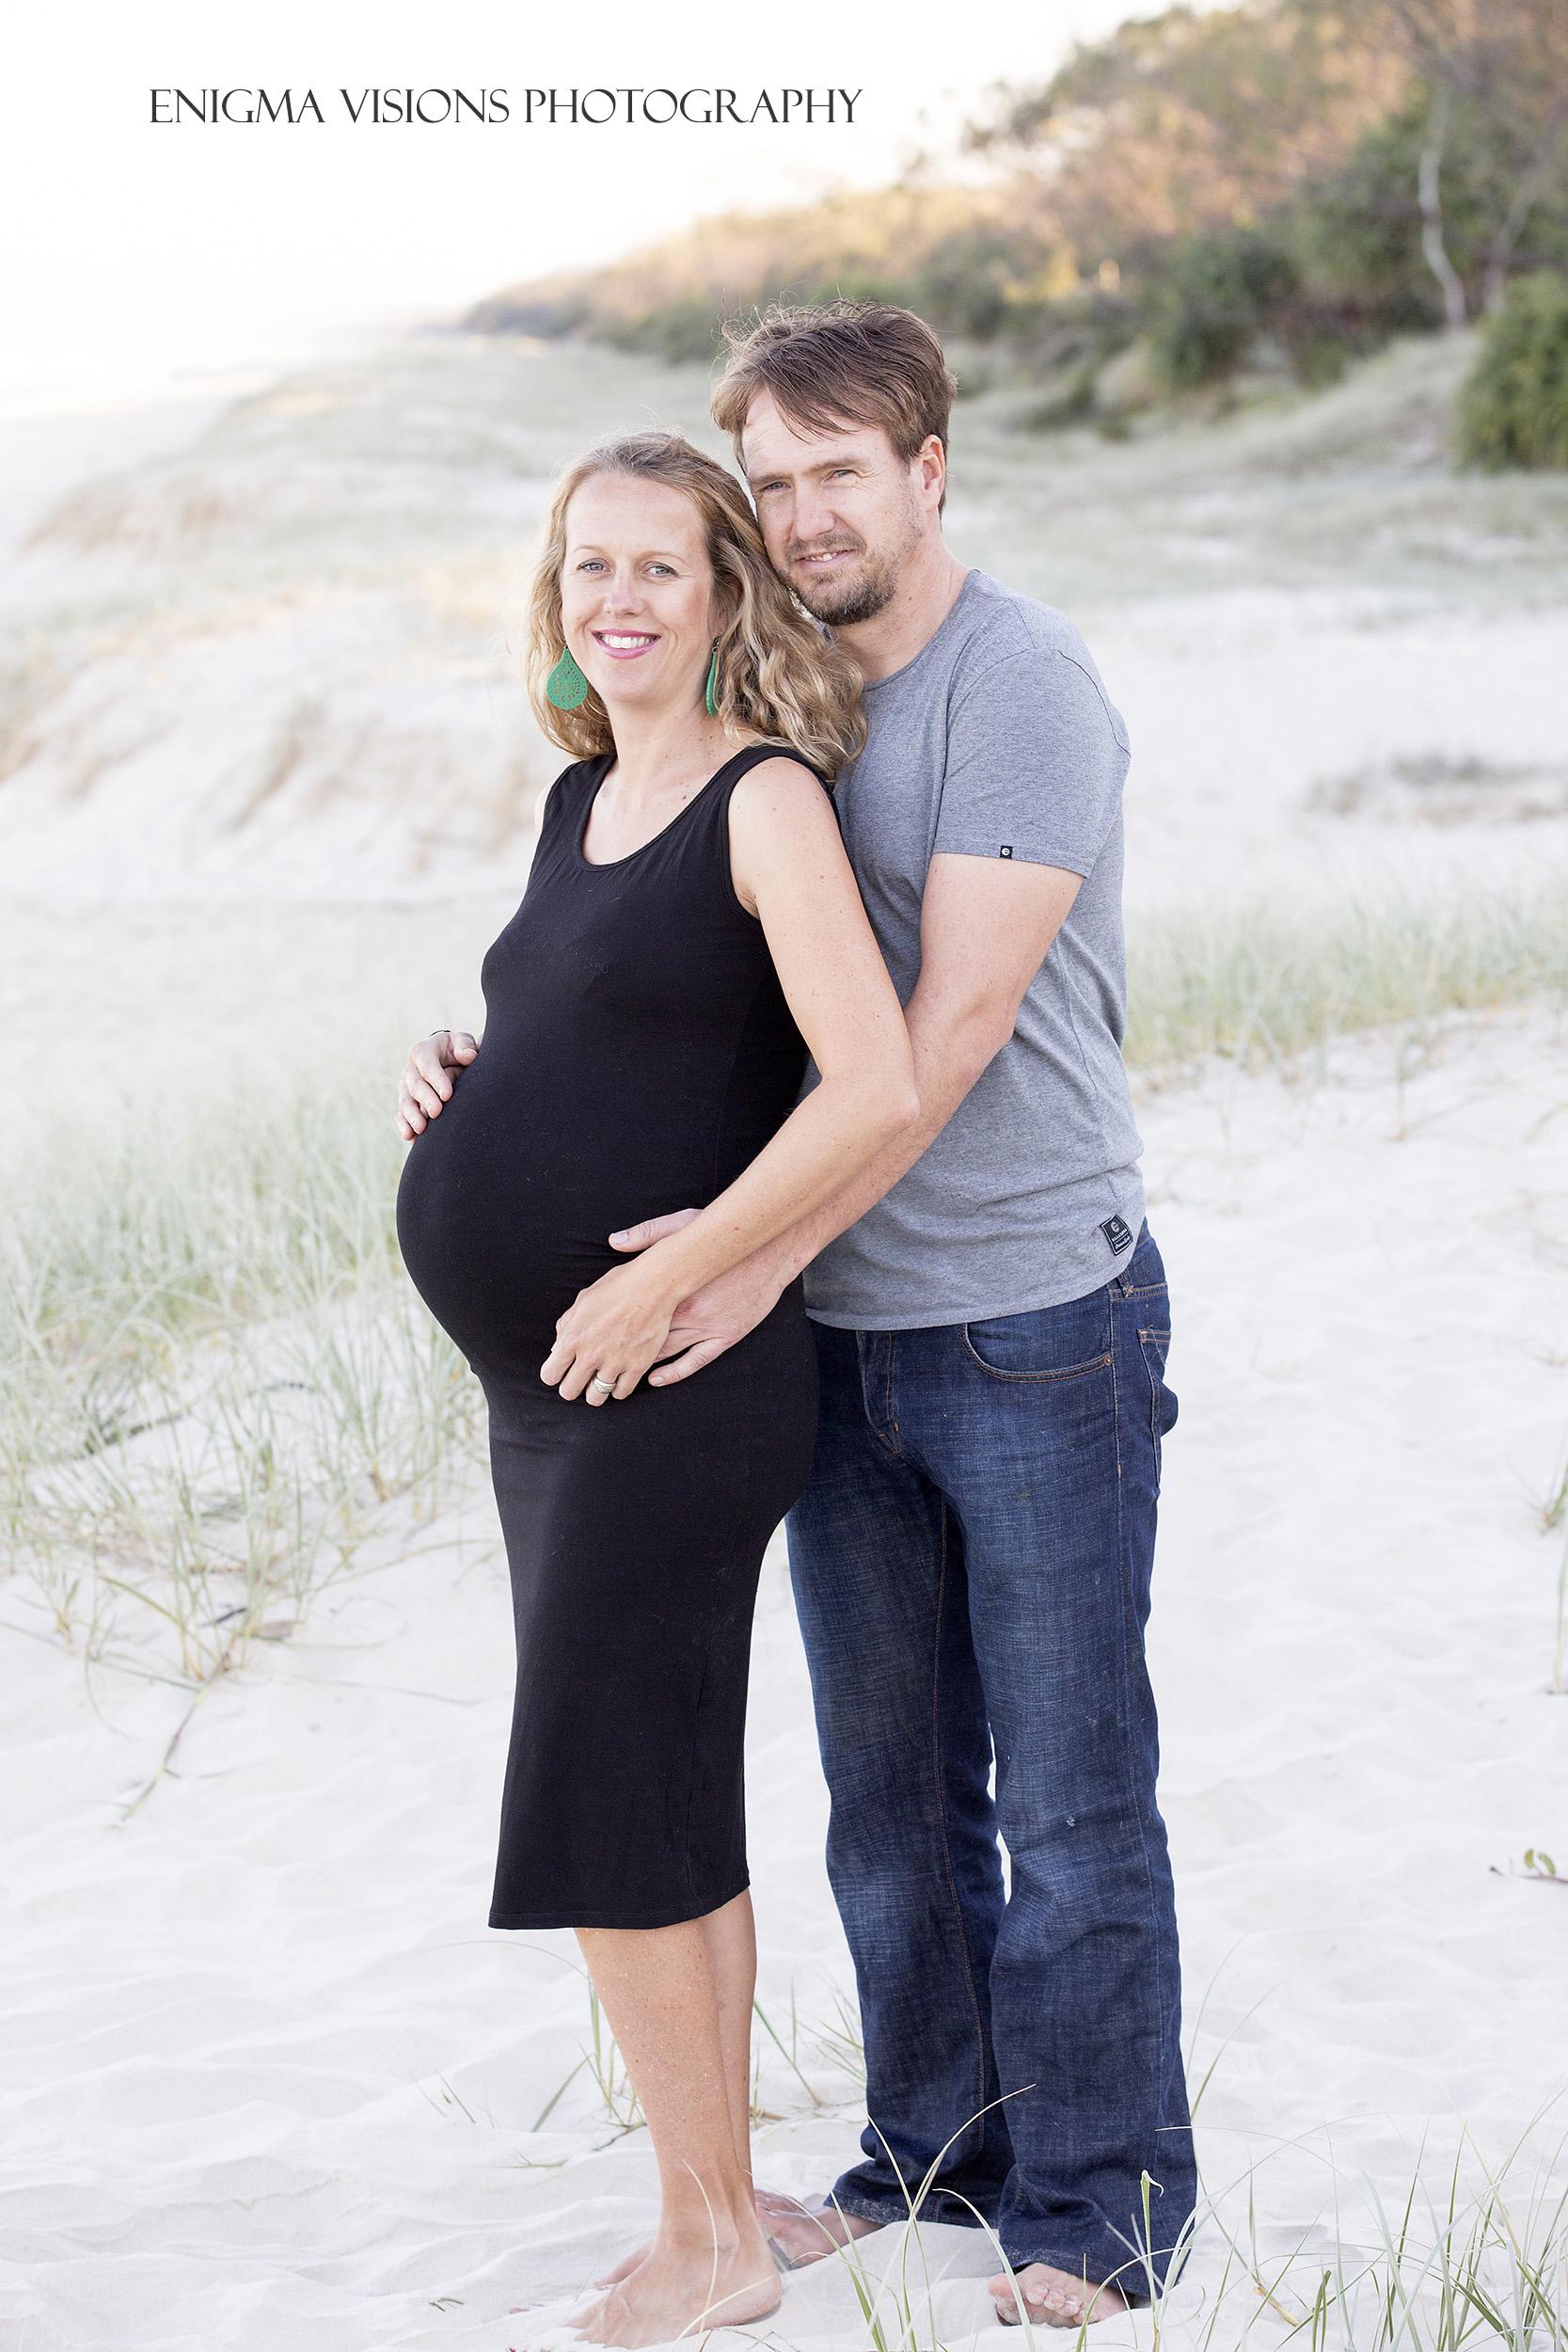 enigma_visions_photography_maternity_melandandrew_kingscliff (18).jpg